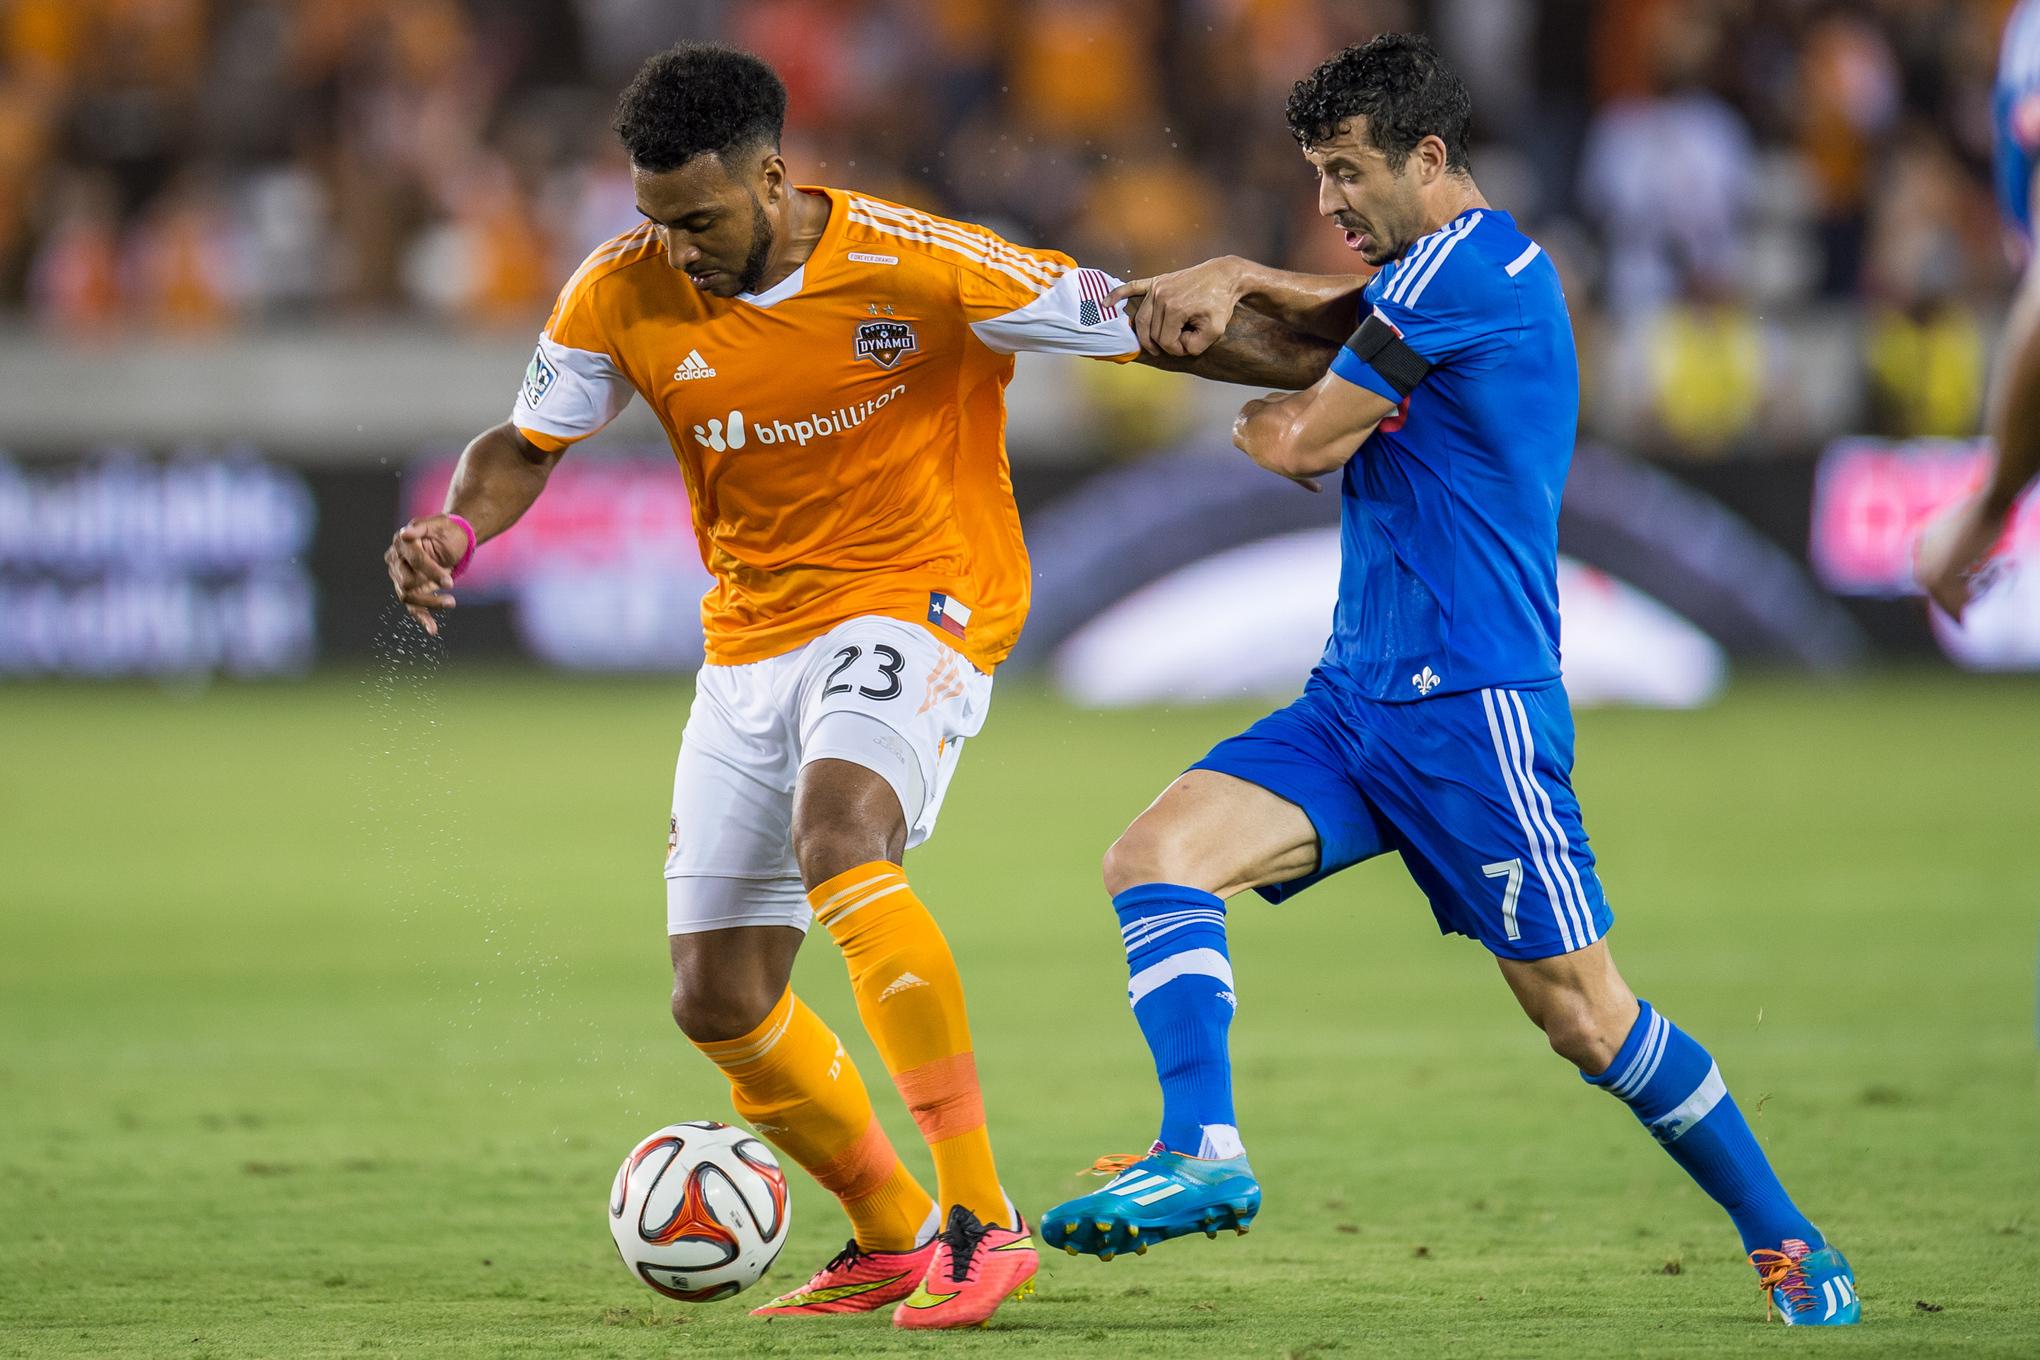 Giles Barnes battles against Felipe Martins as the Dynamo beat the Impact 3-2 on September 6th.